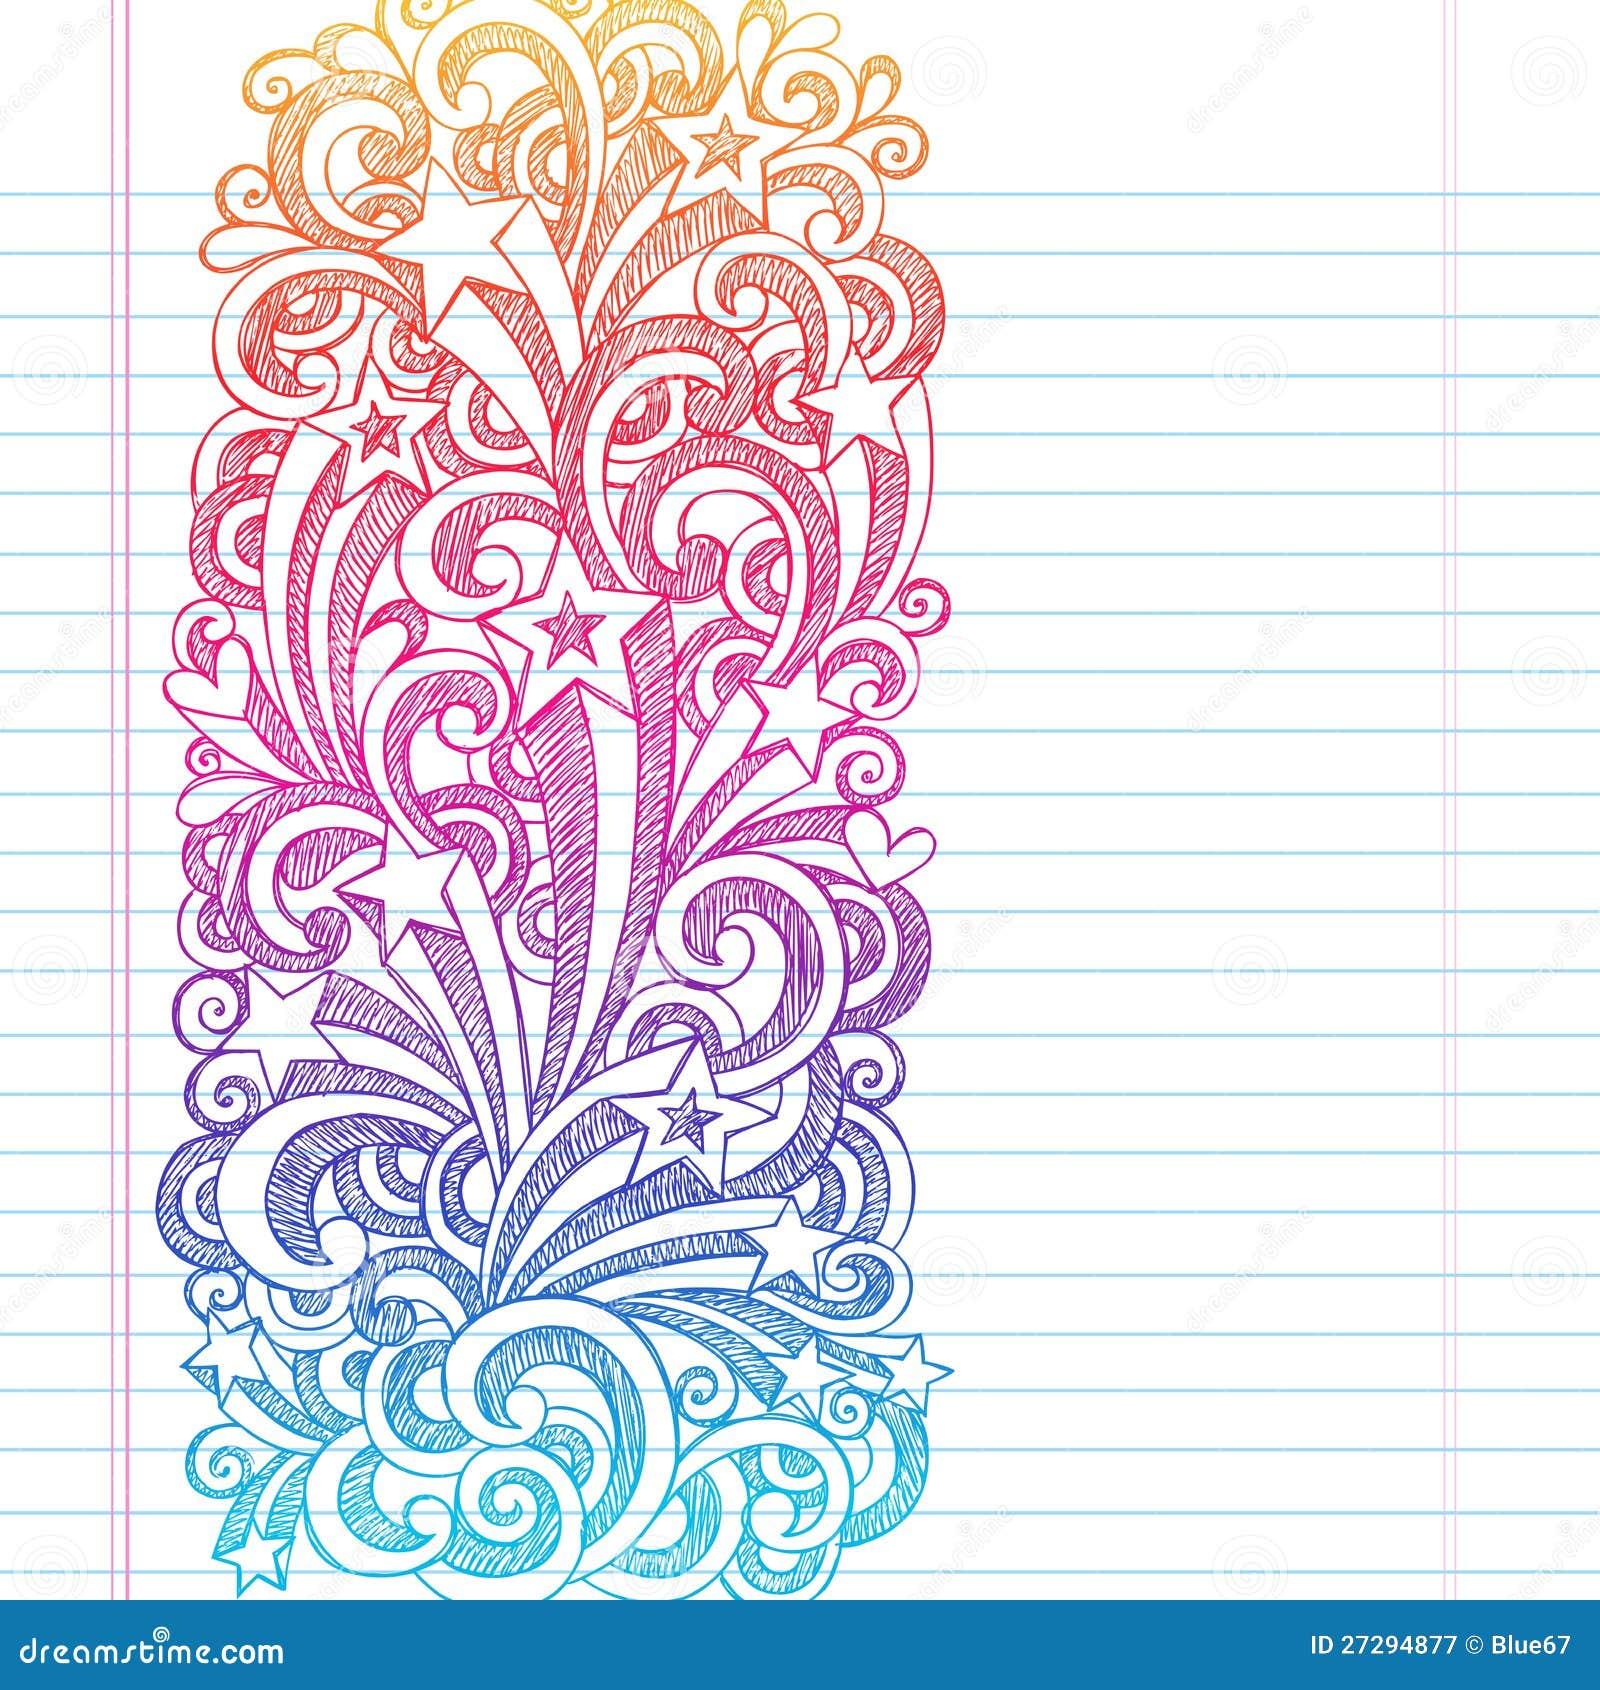 Shooting Stars Back to School Sketchy Notebook Doo